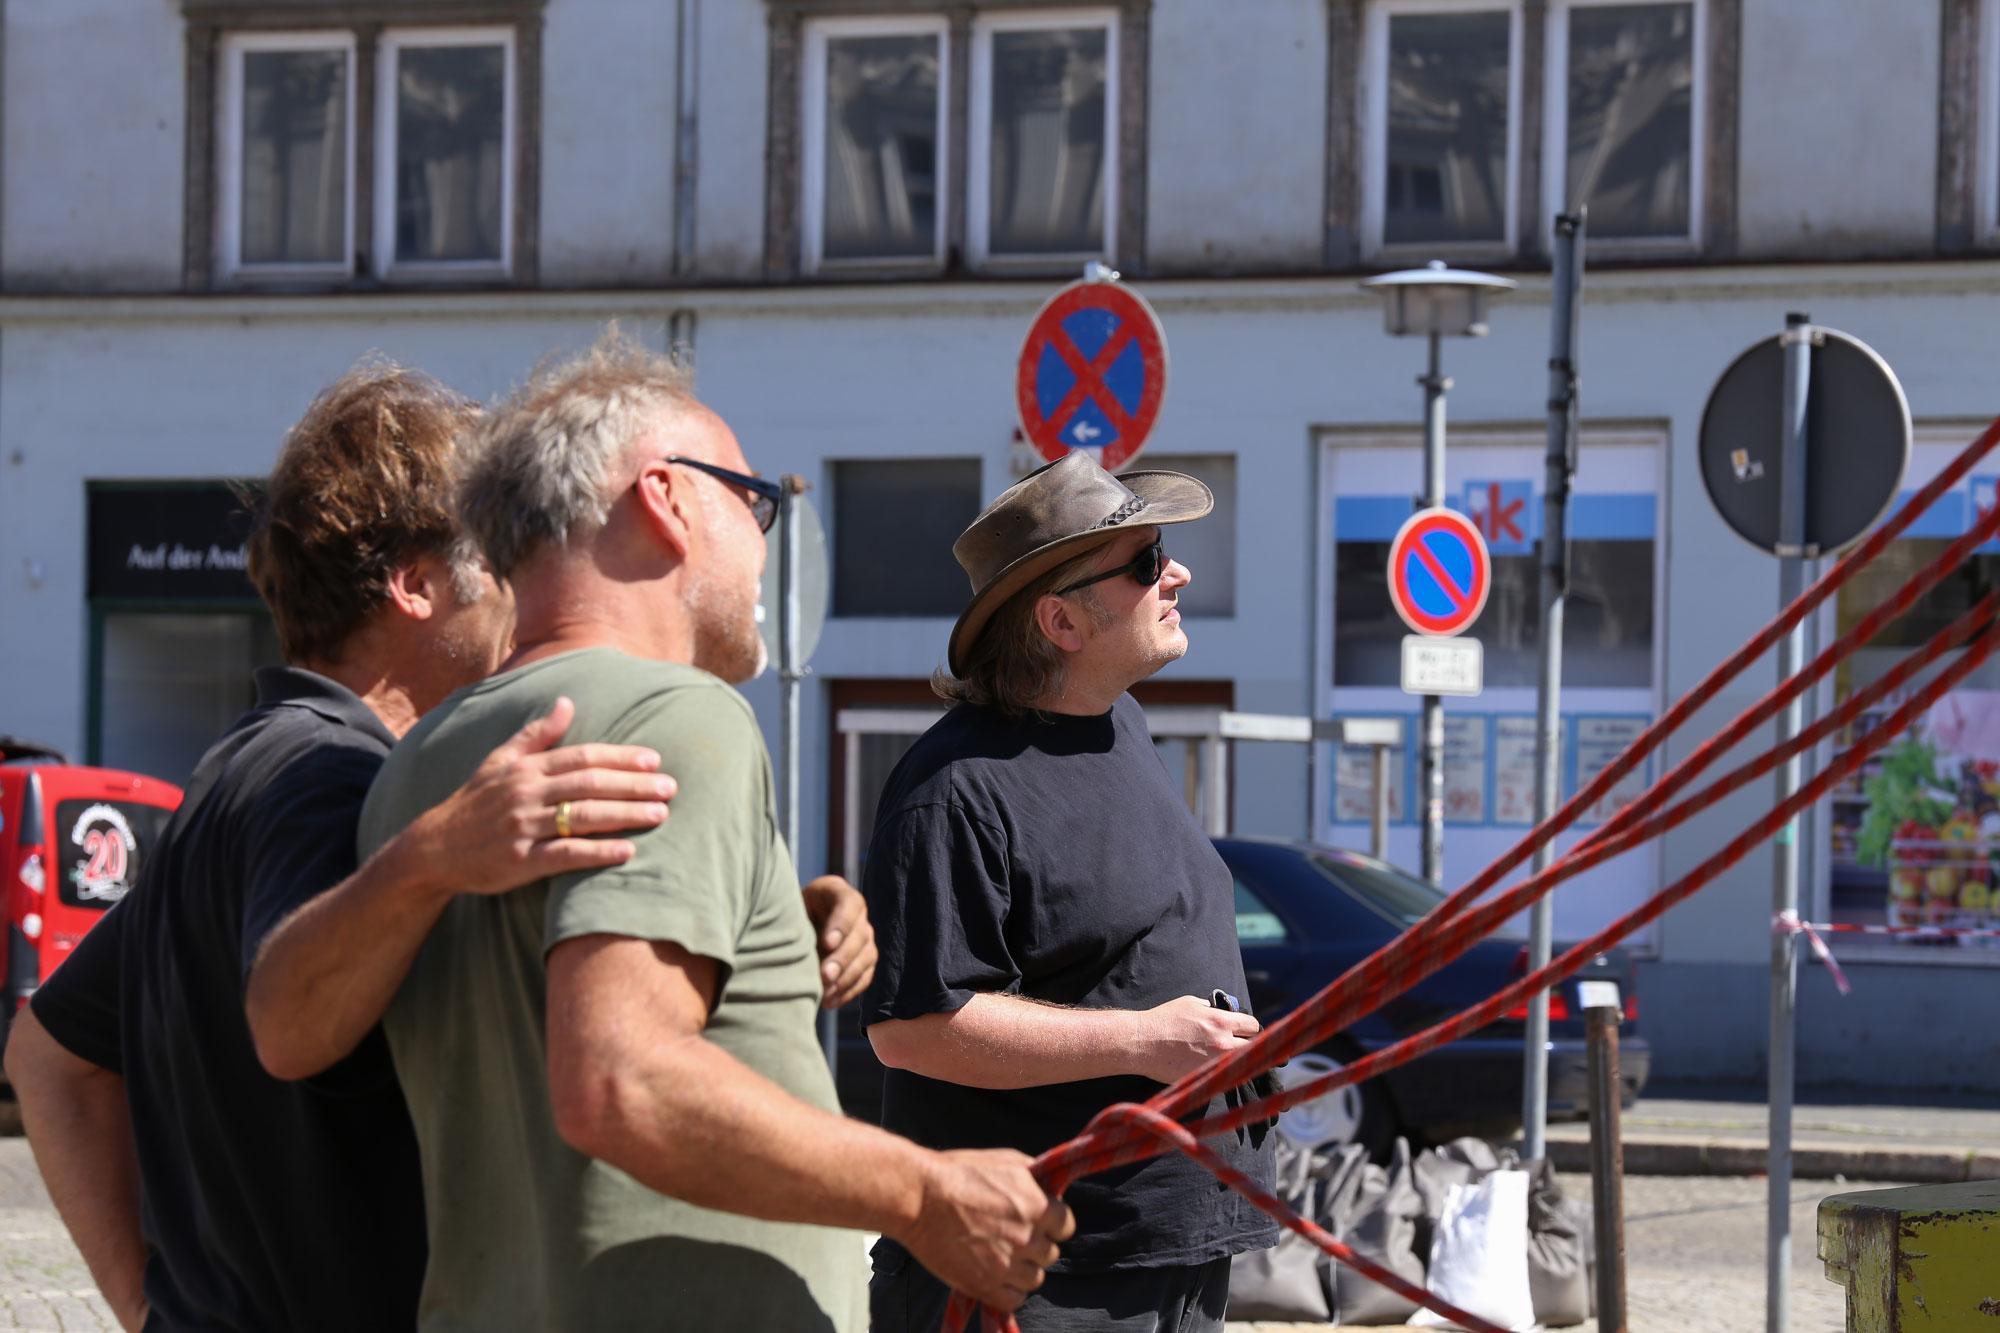 Tom Toussaint, Thomas Preuschoff-Heimsath, Matthias Rettner, Viathea, TRANSITion, Görlitz